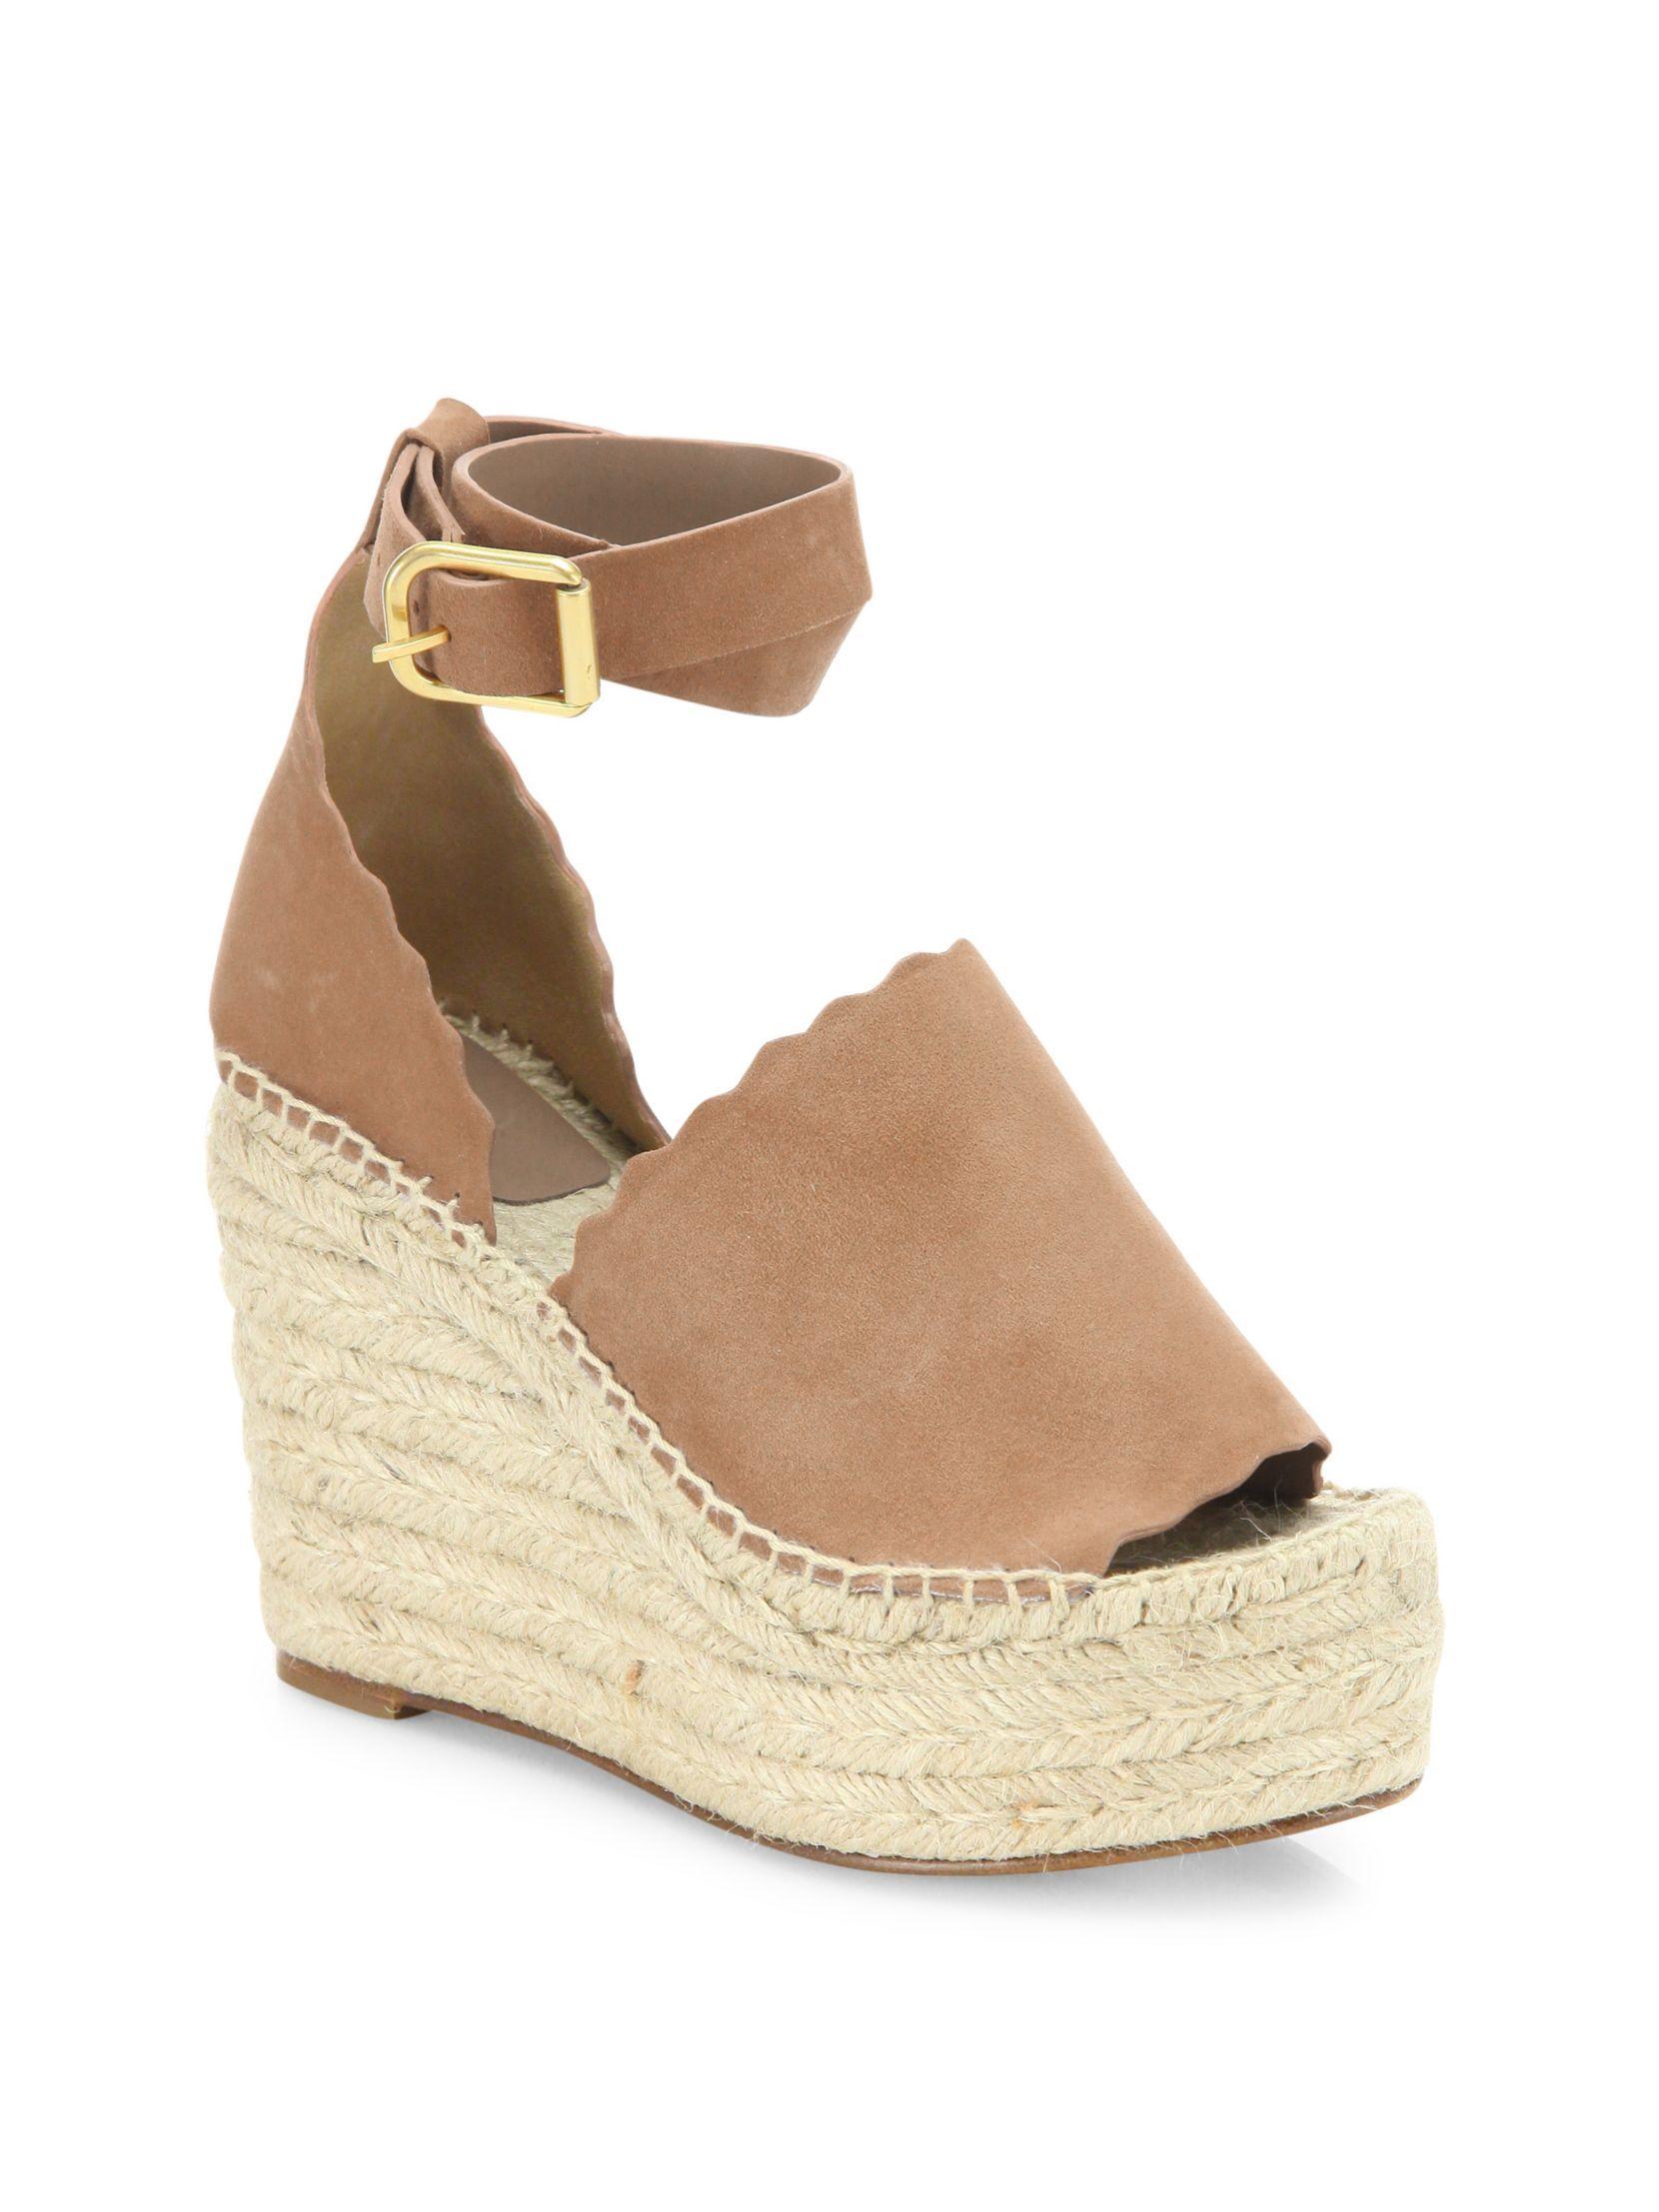 048aa35cc452 Chloe lauren suede ankle strap espadrille wedge sandals shoes jpg 1660x2214 Ankle  tie espadrille wedge sandal